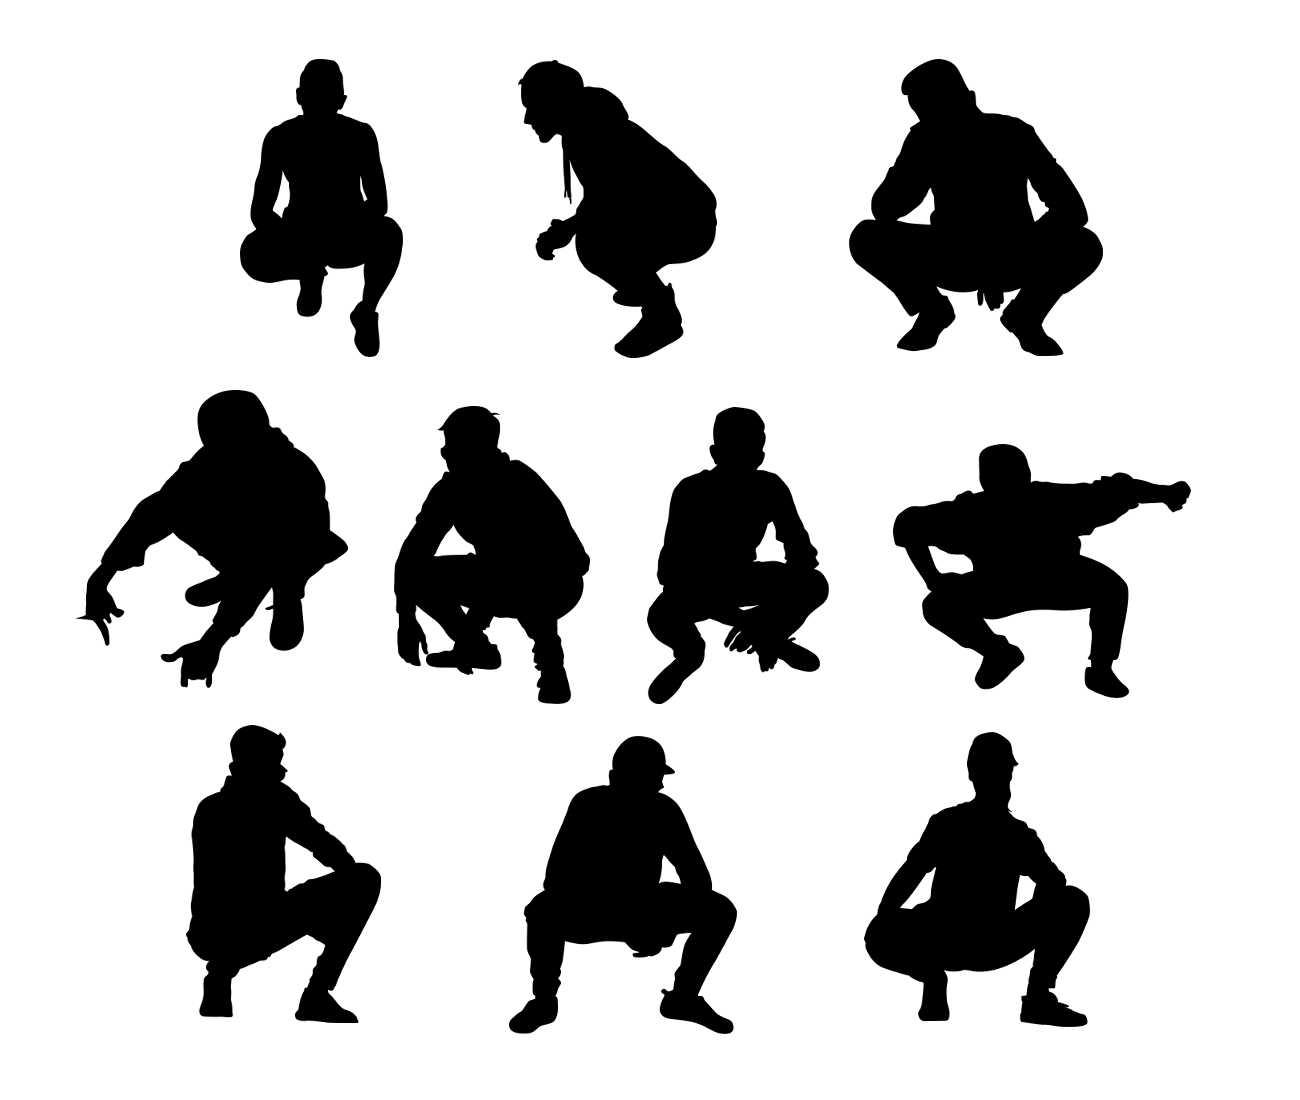 10-gopnik-squat-silhouette-cover.jpg